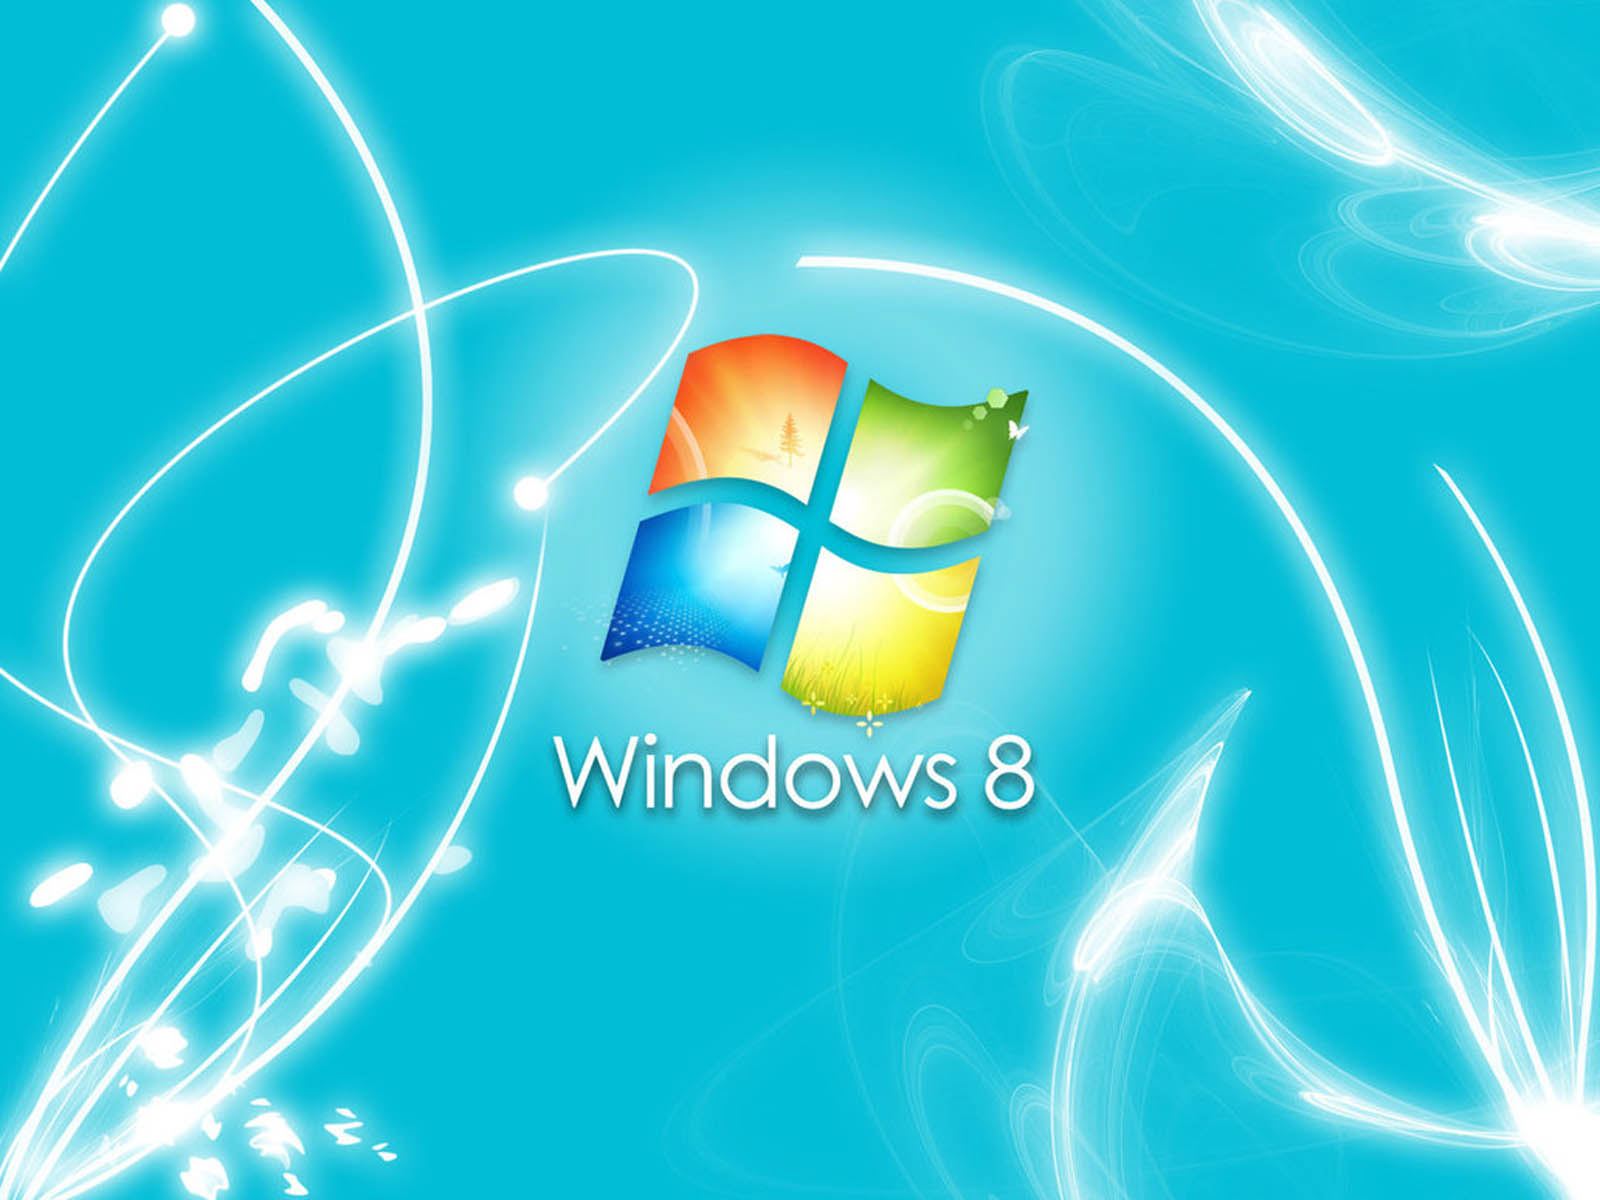 wallpapers: Windows 8 Desktop Wallpapers and Backgrounds